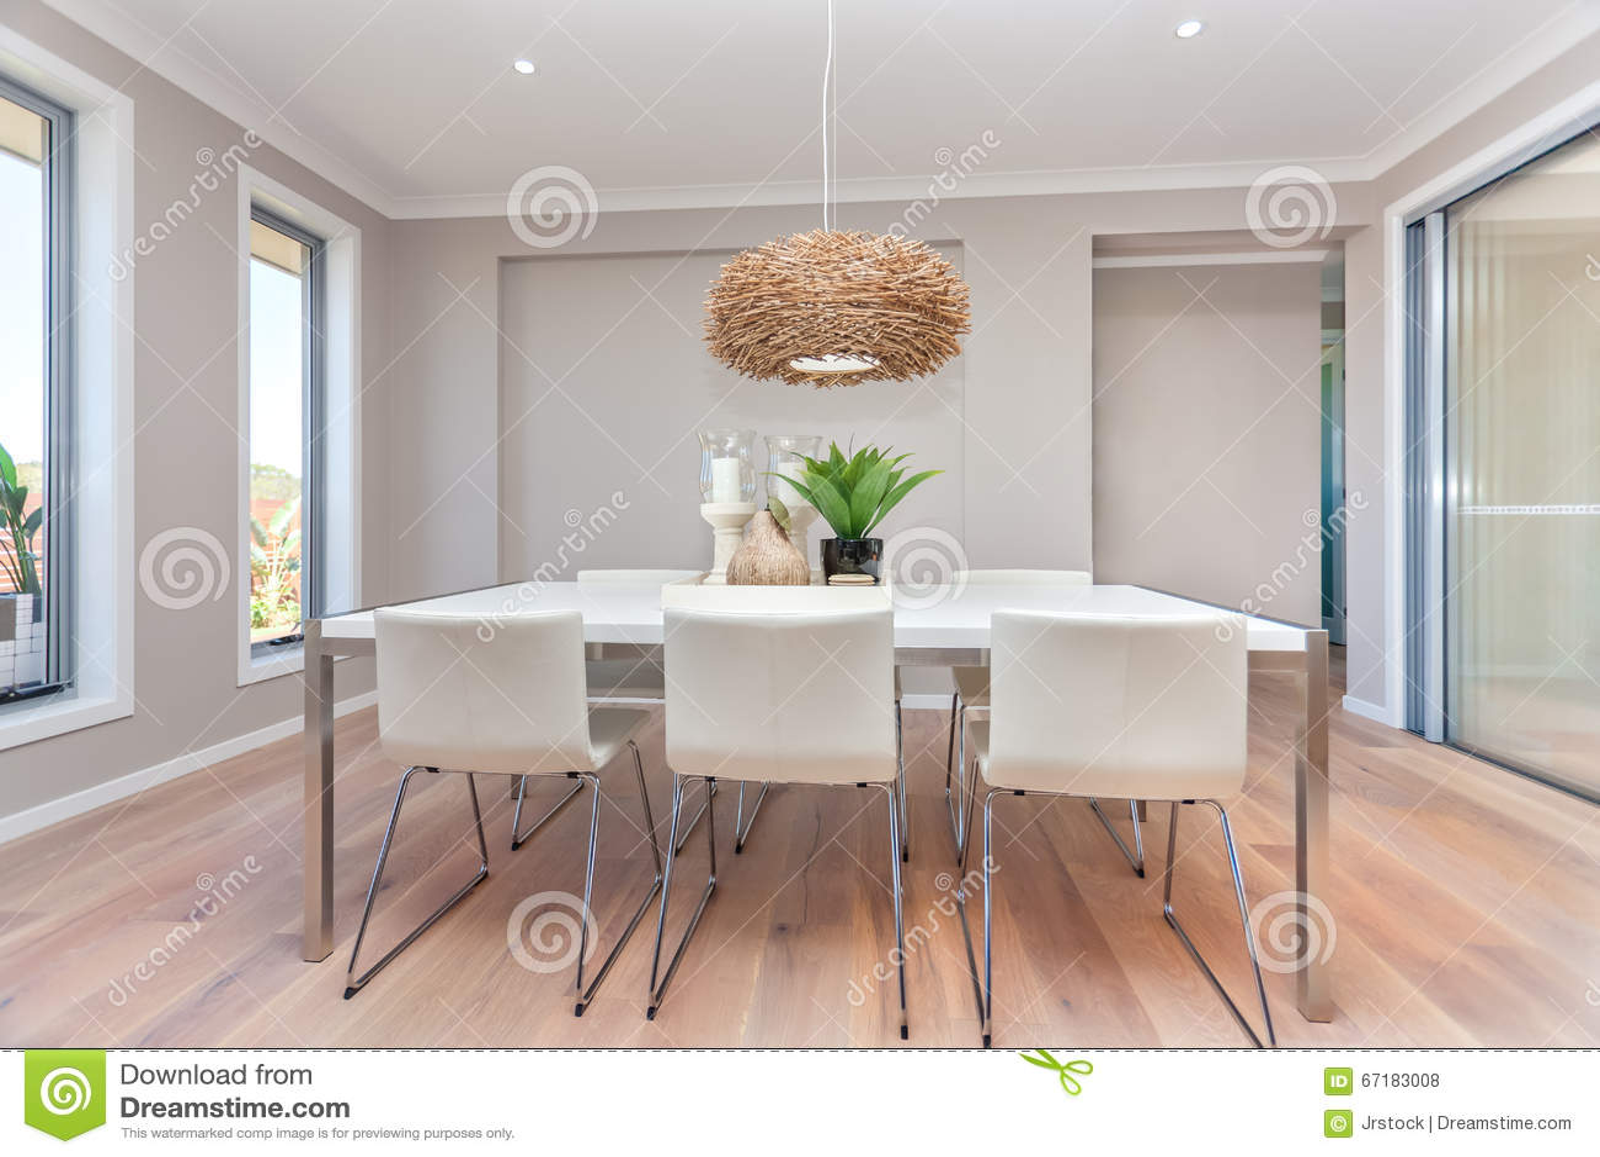 Arredo sala da pranzo moderna free sala da pranzo moderna decorazione idee idee di arredamento - Arredo sala da pranzo moderna ...